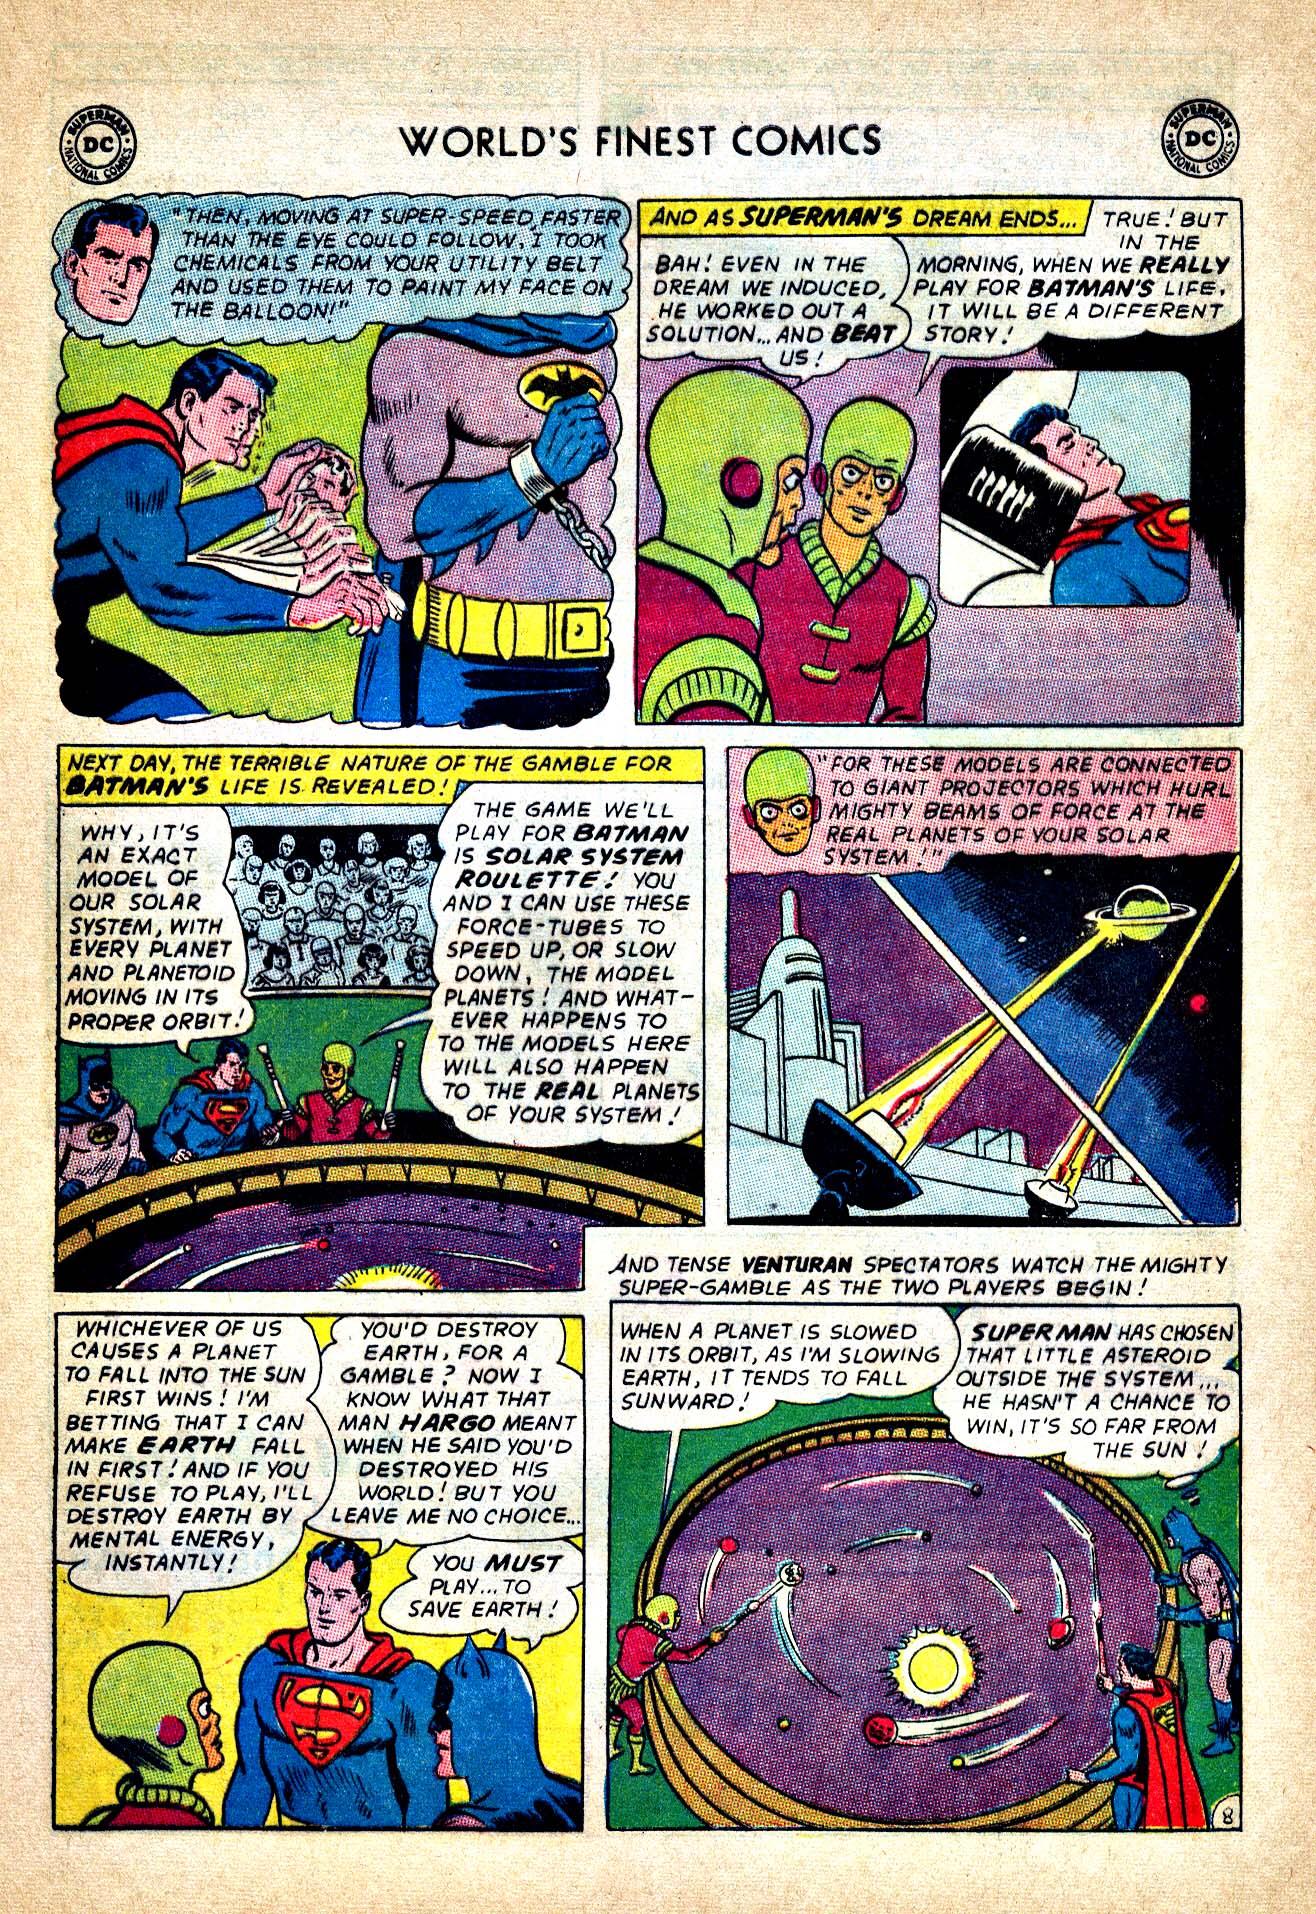 Read online World's Finest Comics comic -  Issue #150 - 21